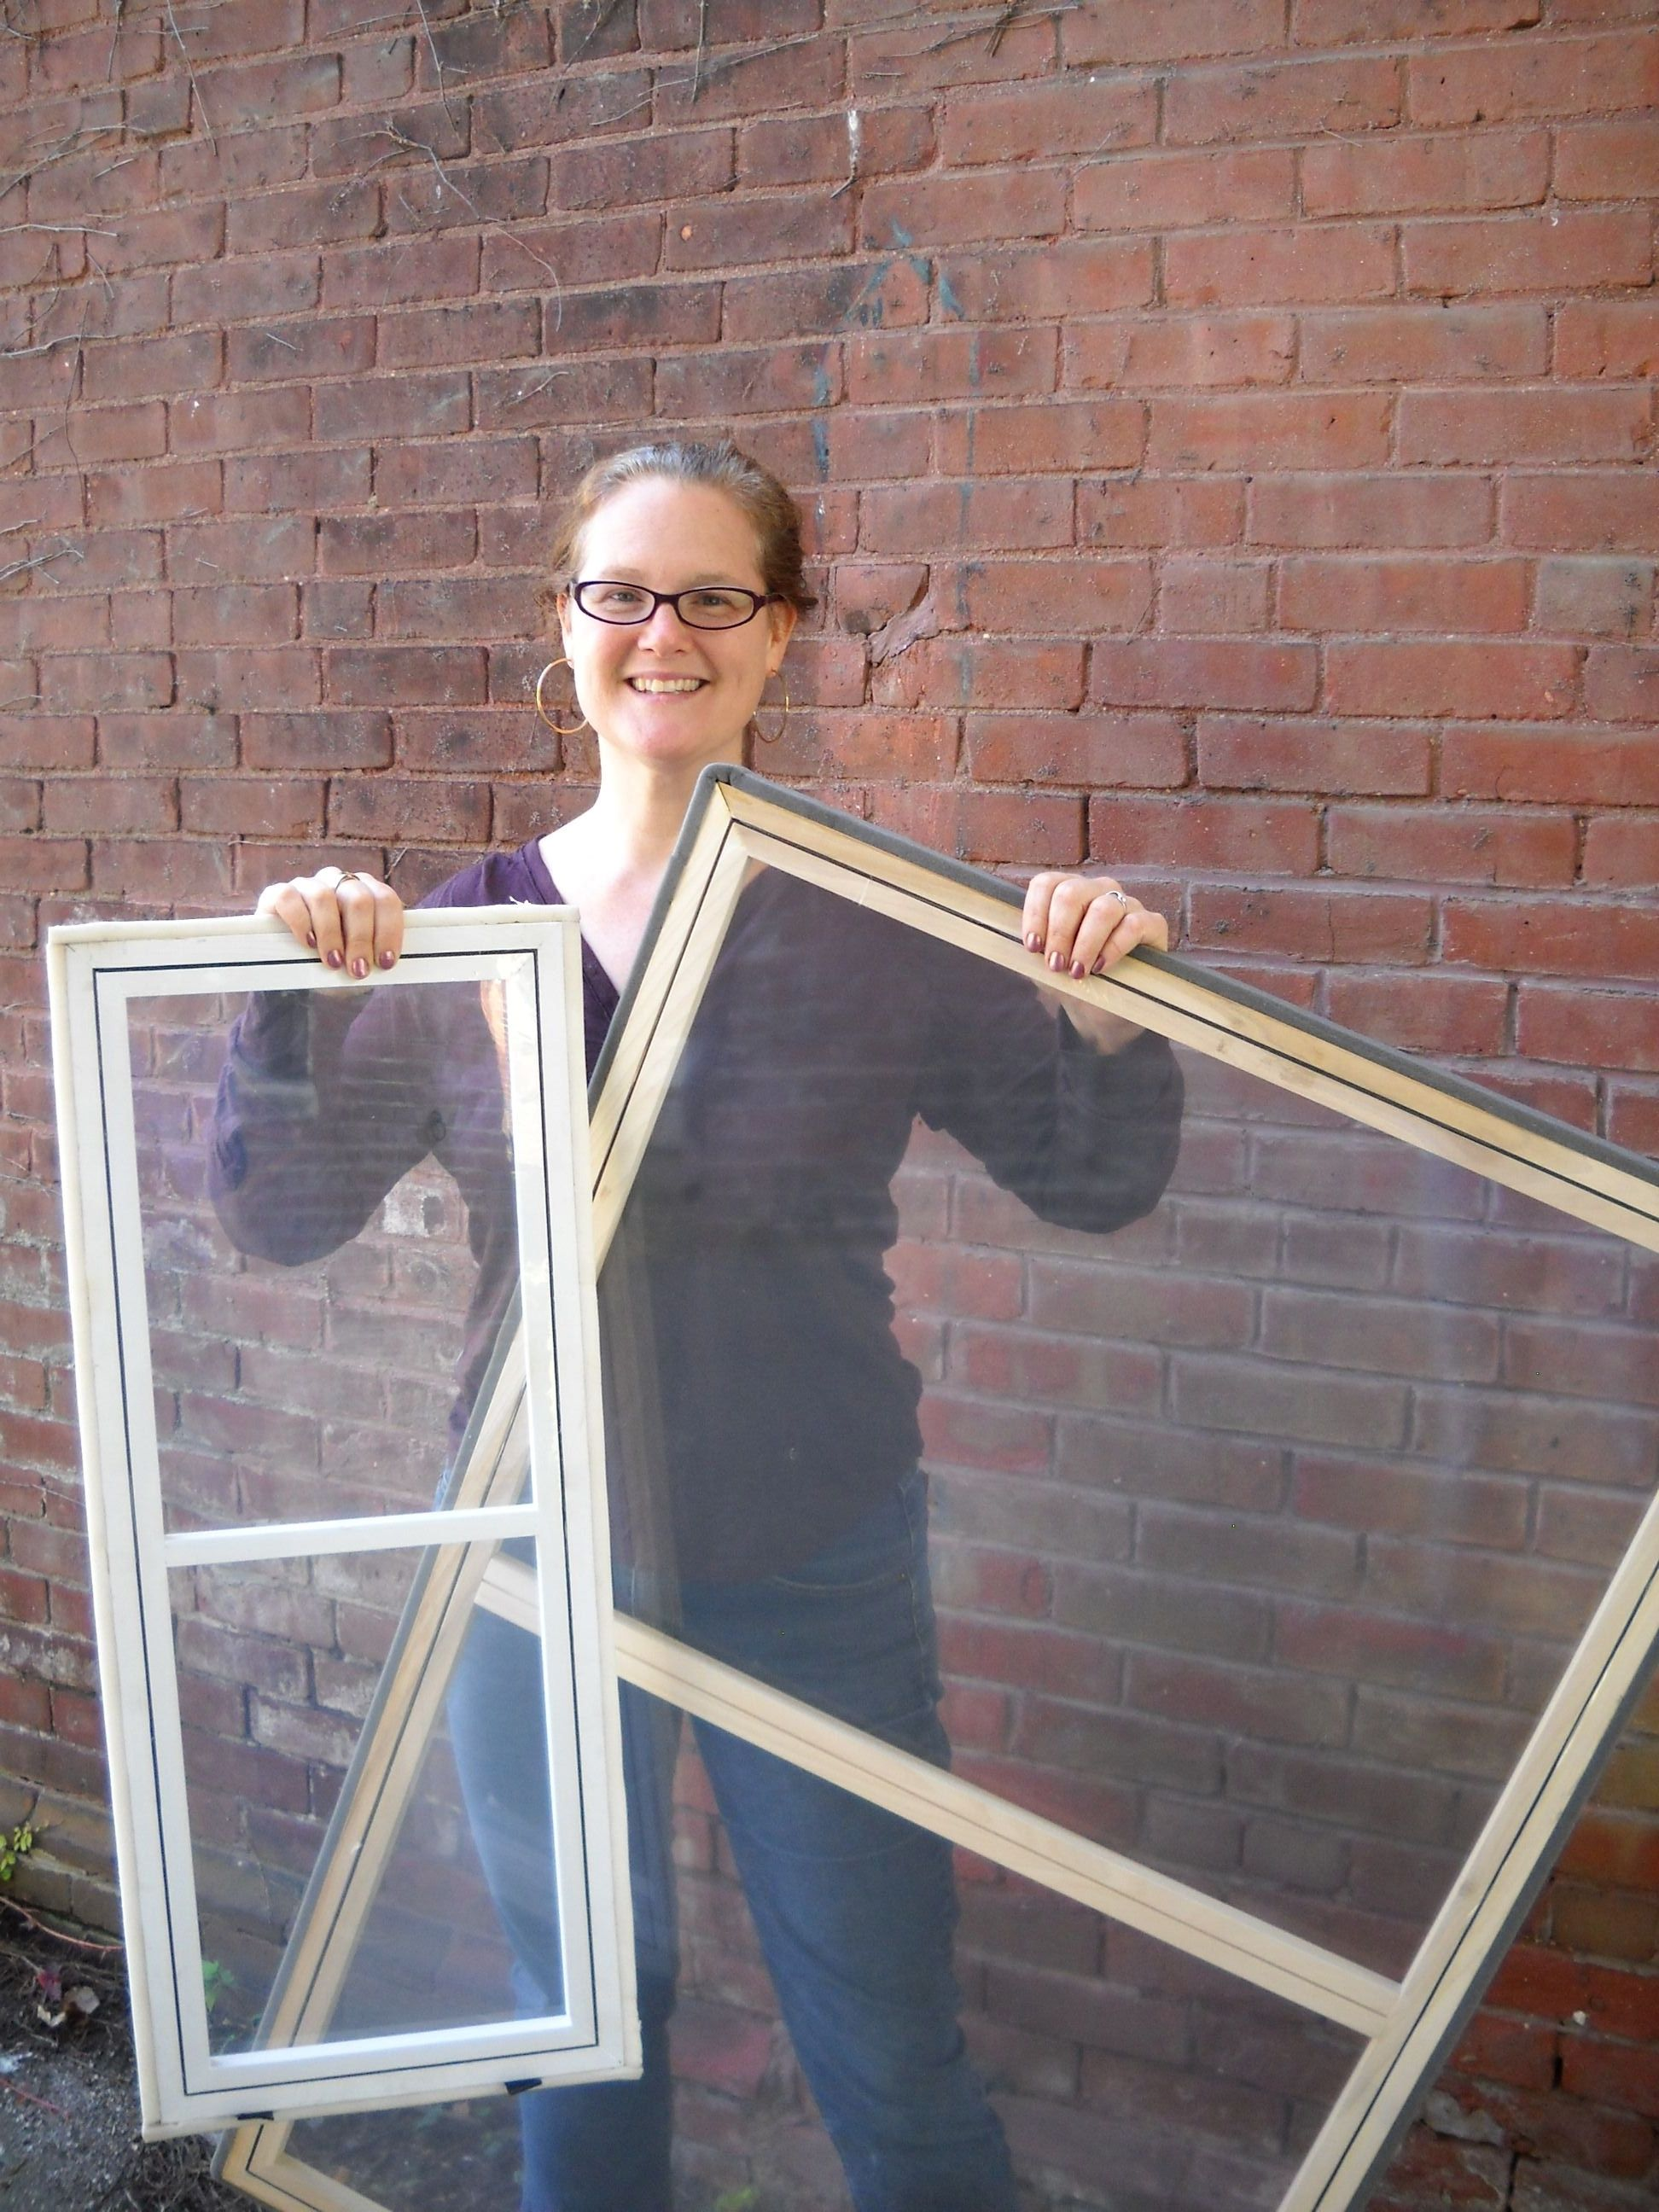 Window Repair, Households, Insulation, Restore, Saving Money, Curb Appeal,  Porch, Workshop, Restoration